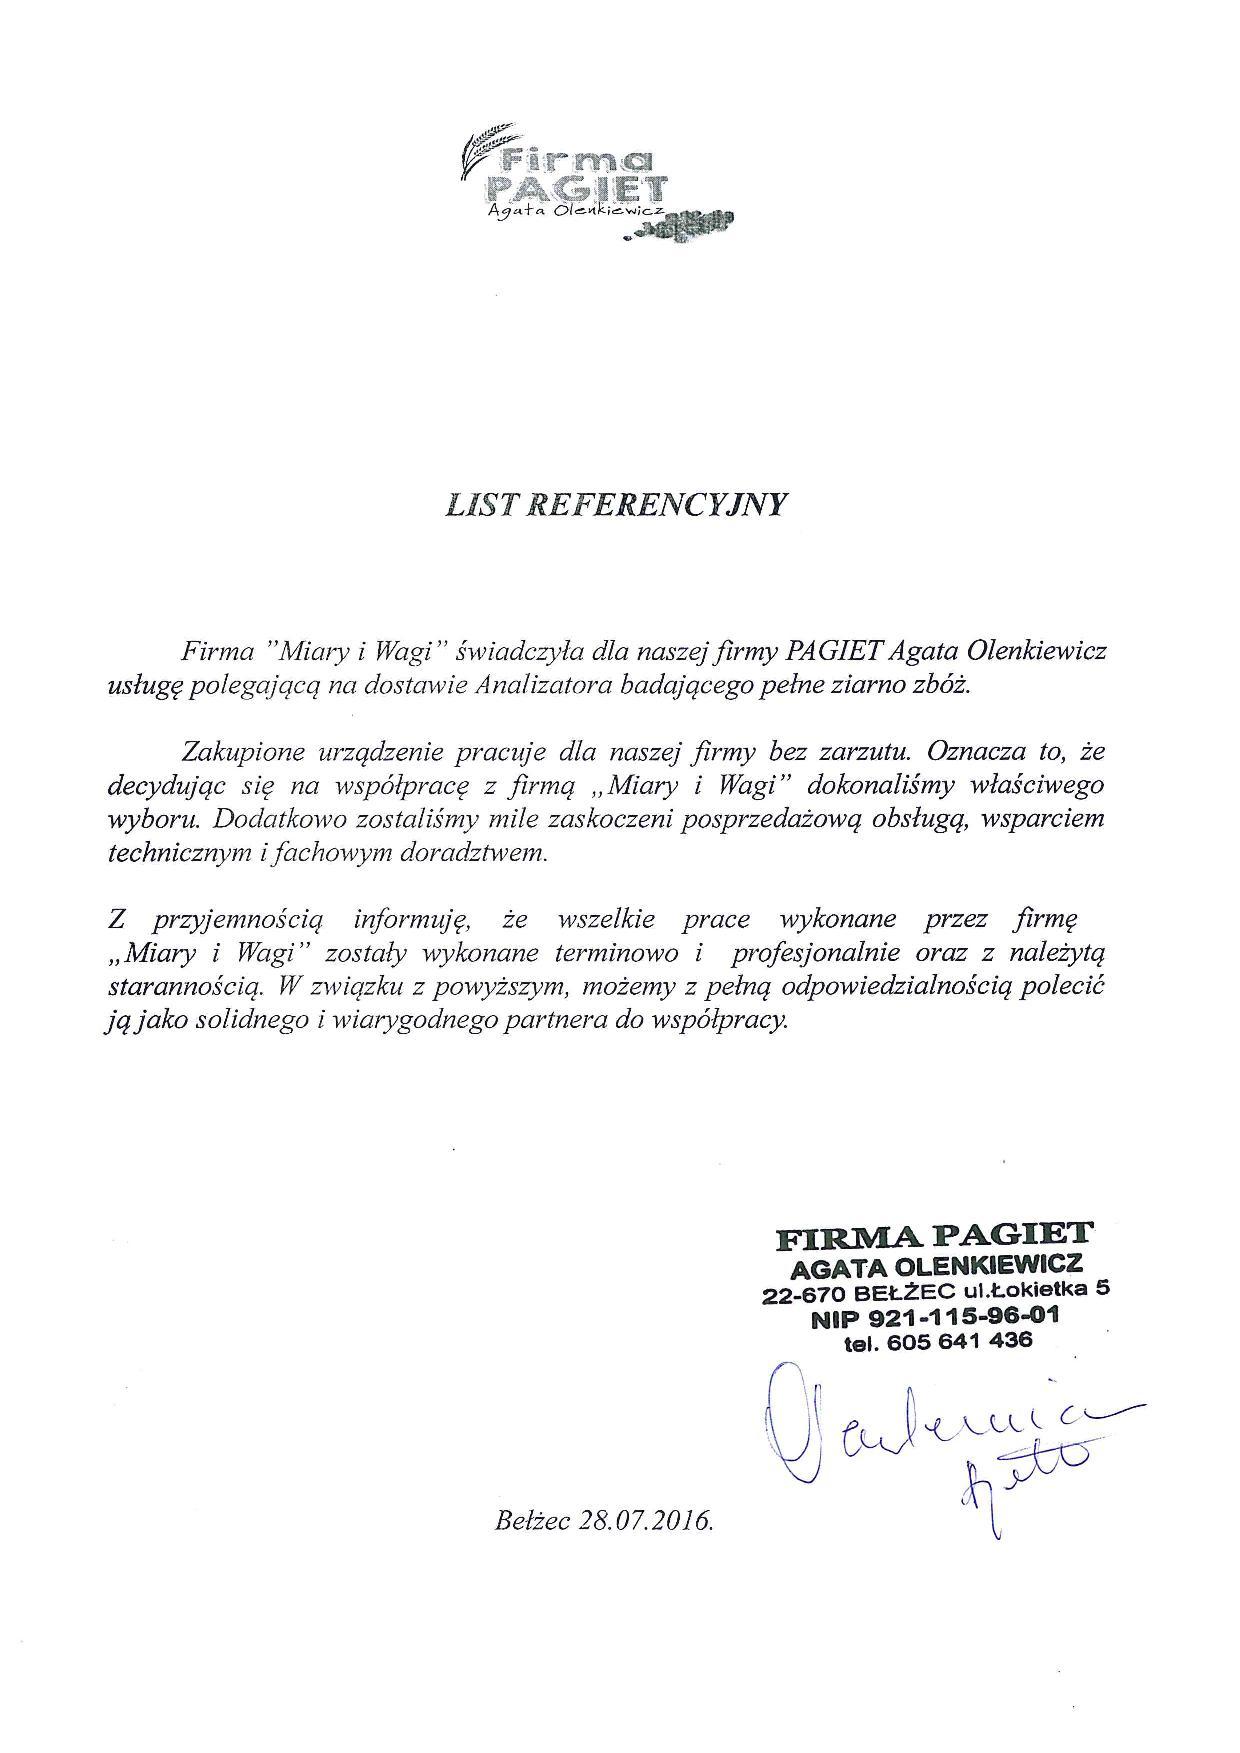 https://www.miary-wagi.pl/wp-content/uploads/2017/07/Pagiet.jpg